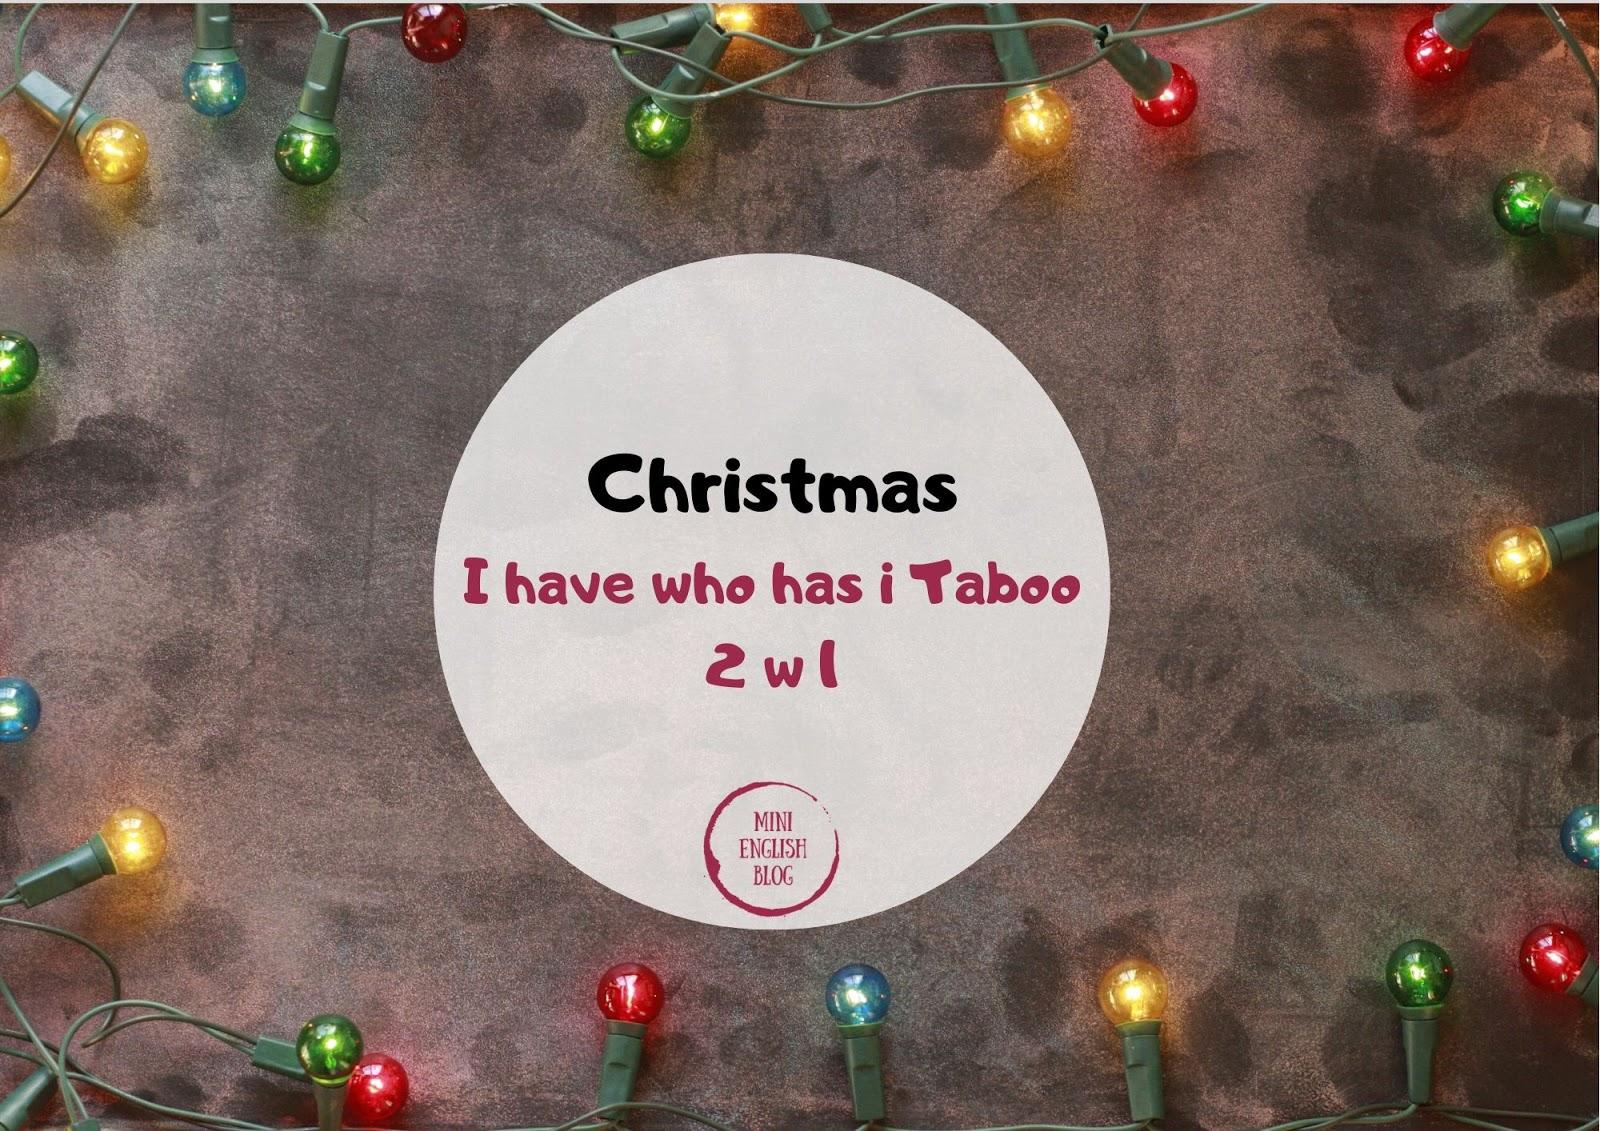 Christmas. I have who has ...Taboo!